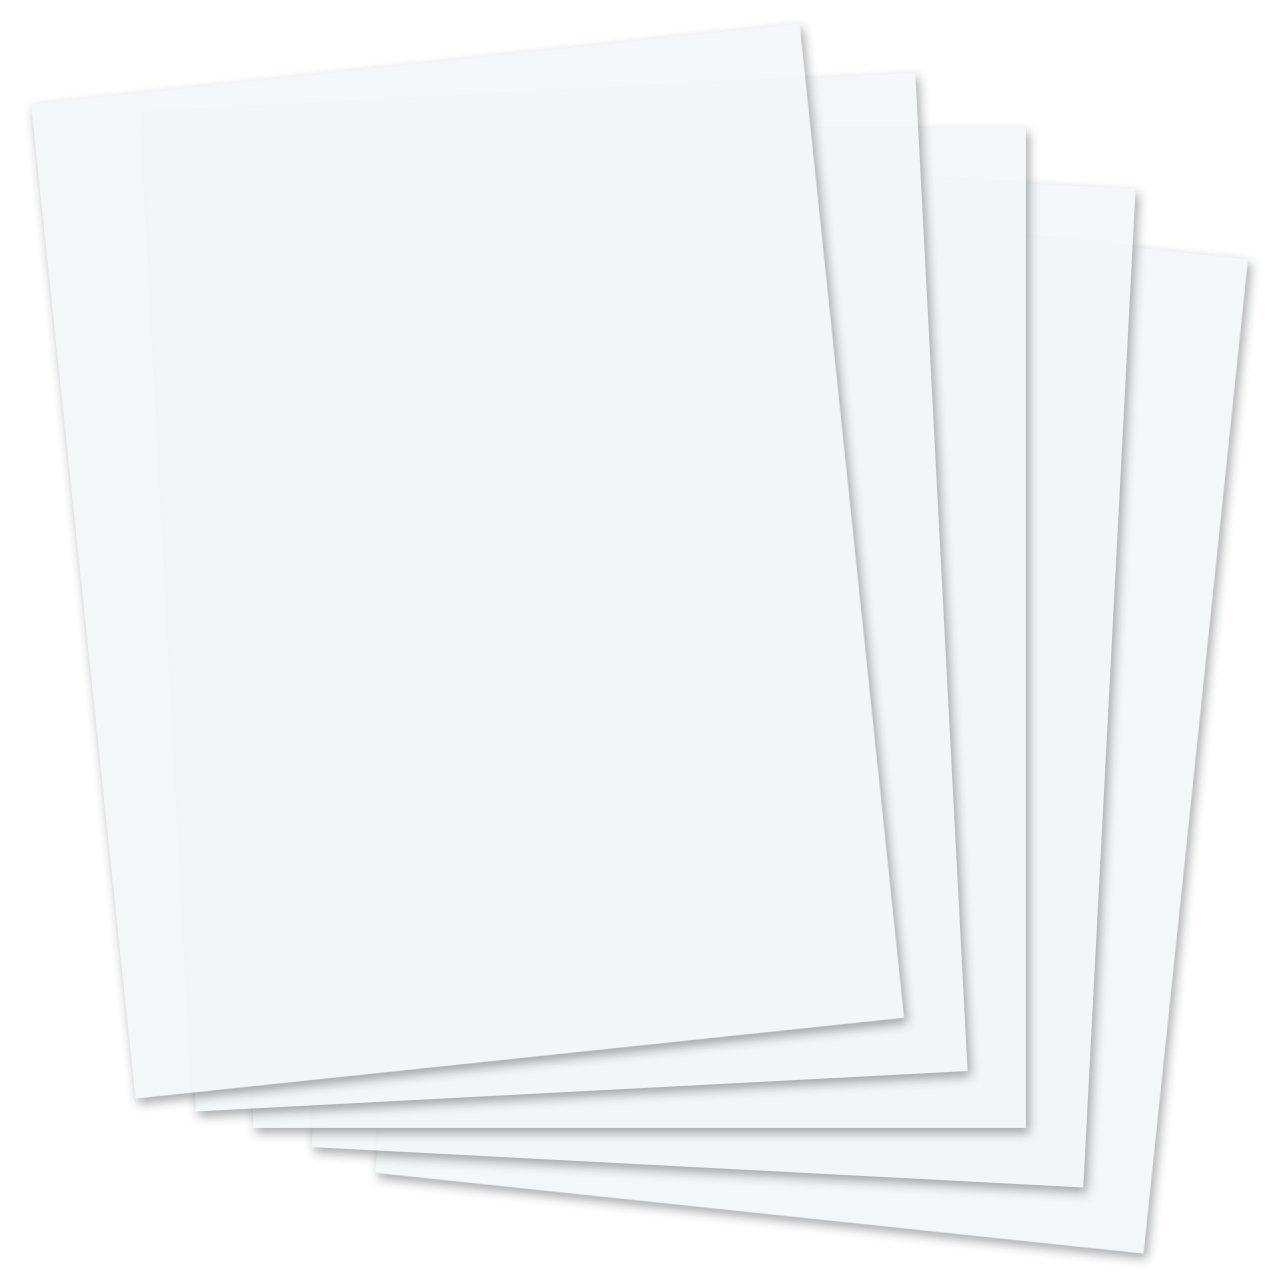 SmartSolve IT117138 8.5'' x 11'' Dissolving Paper (Pack of 25)